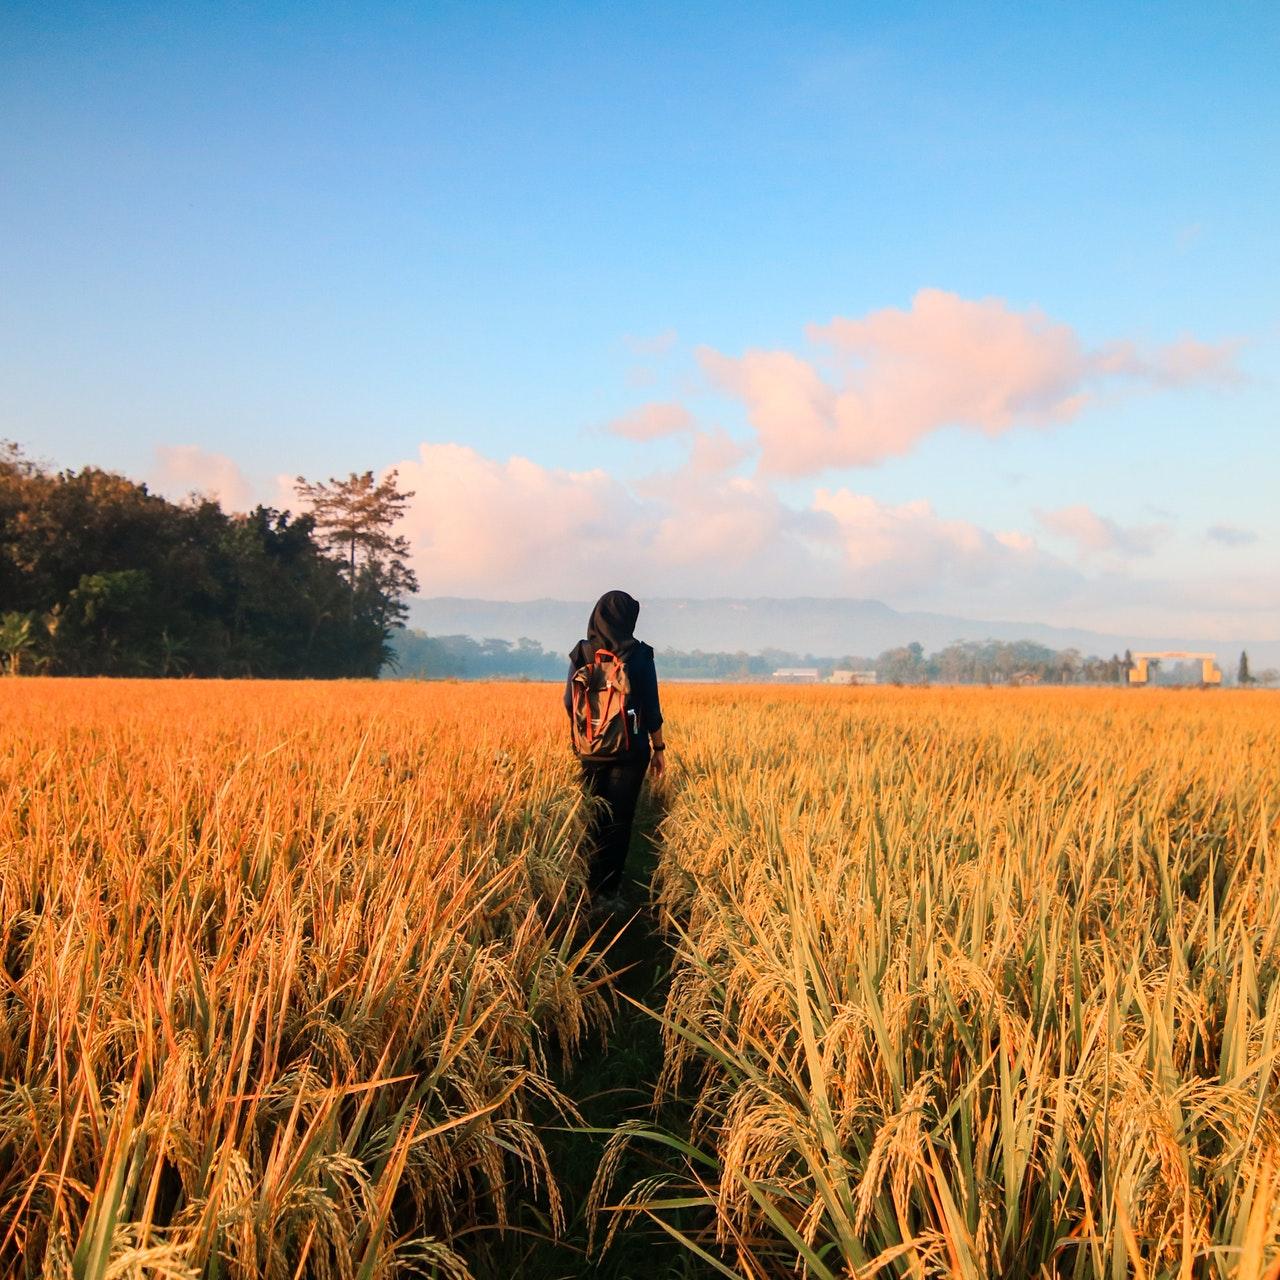 jacob travels to paddan aram for a wife www.atozmomm.com